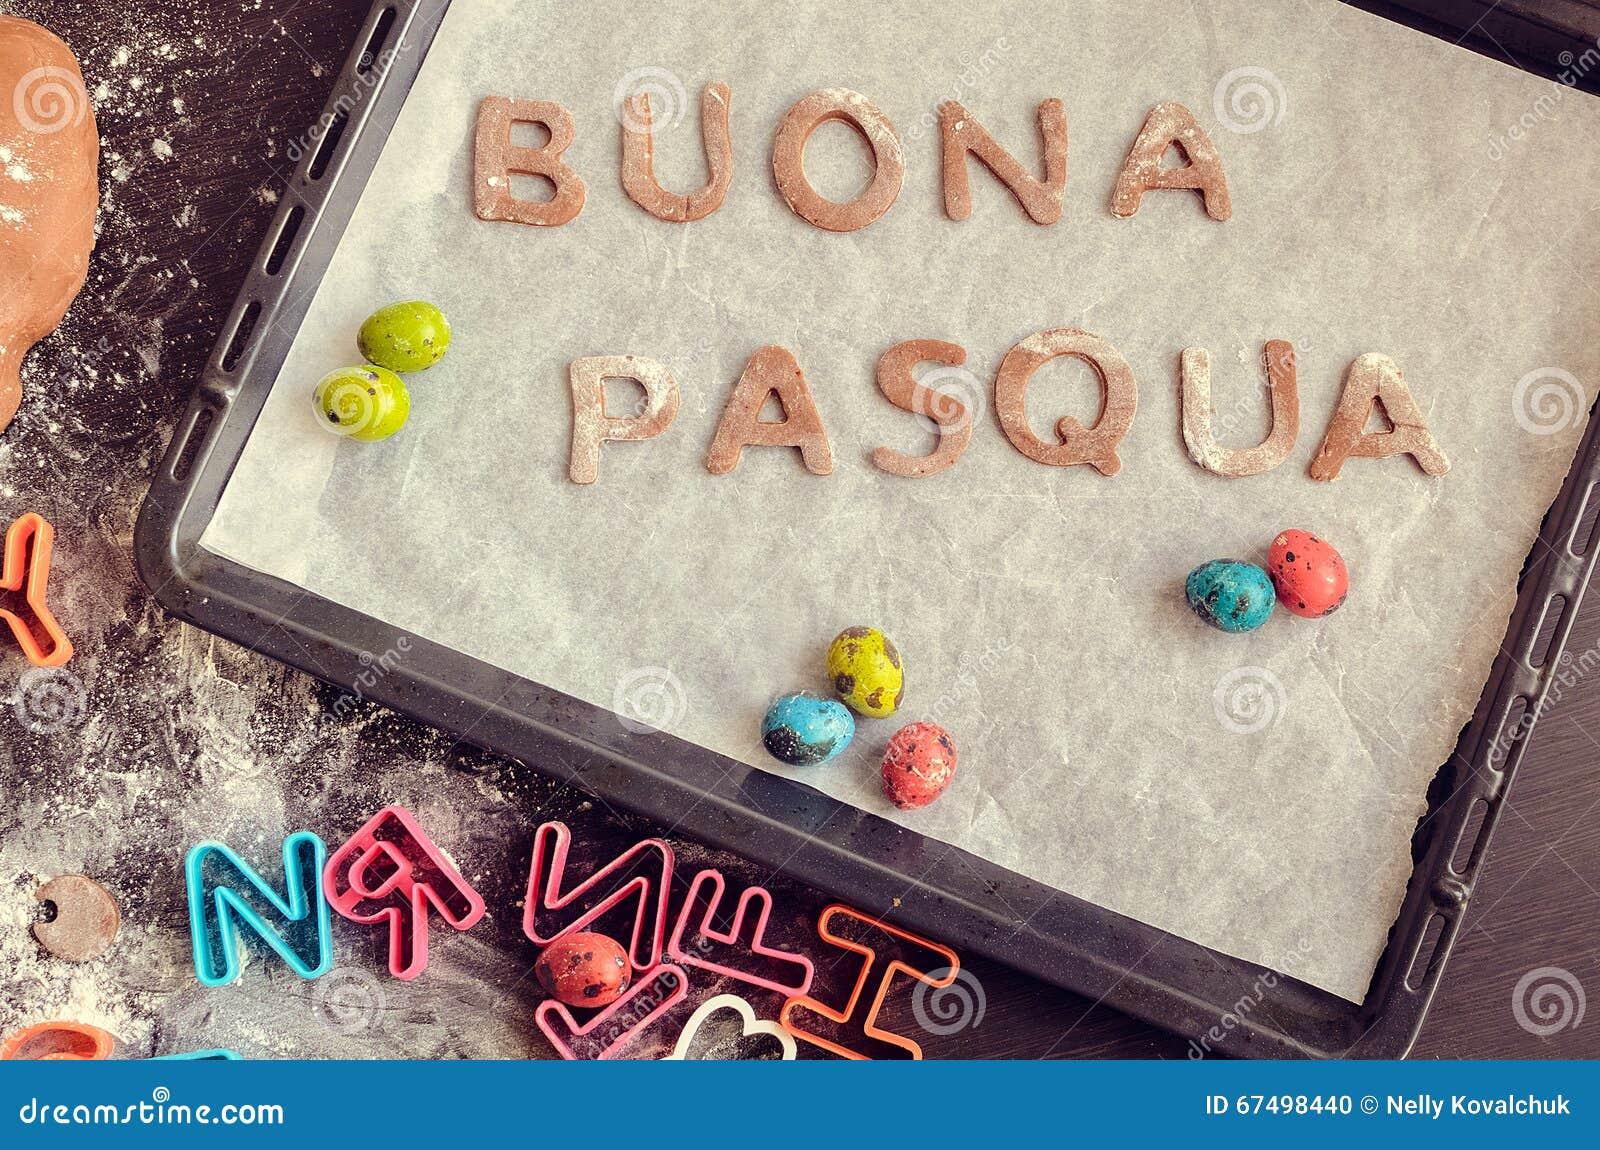 Words Buona Pasqua As Happy Easter In Italian Language Stock Photo